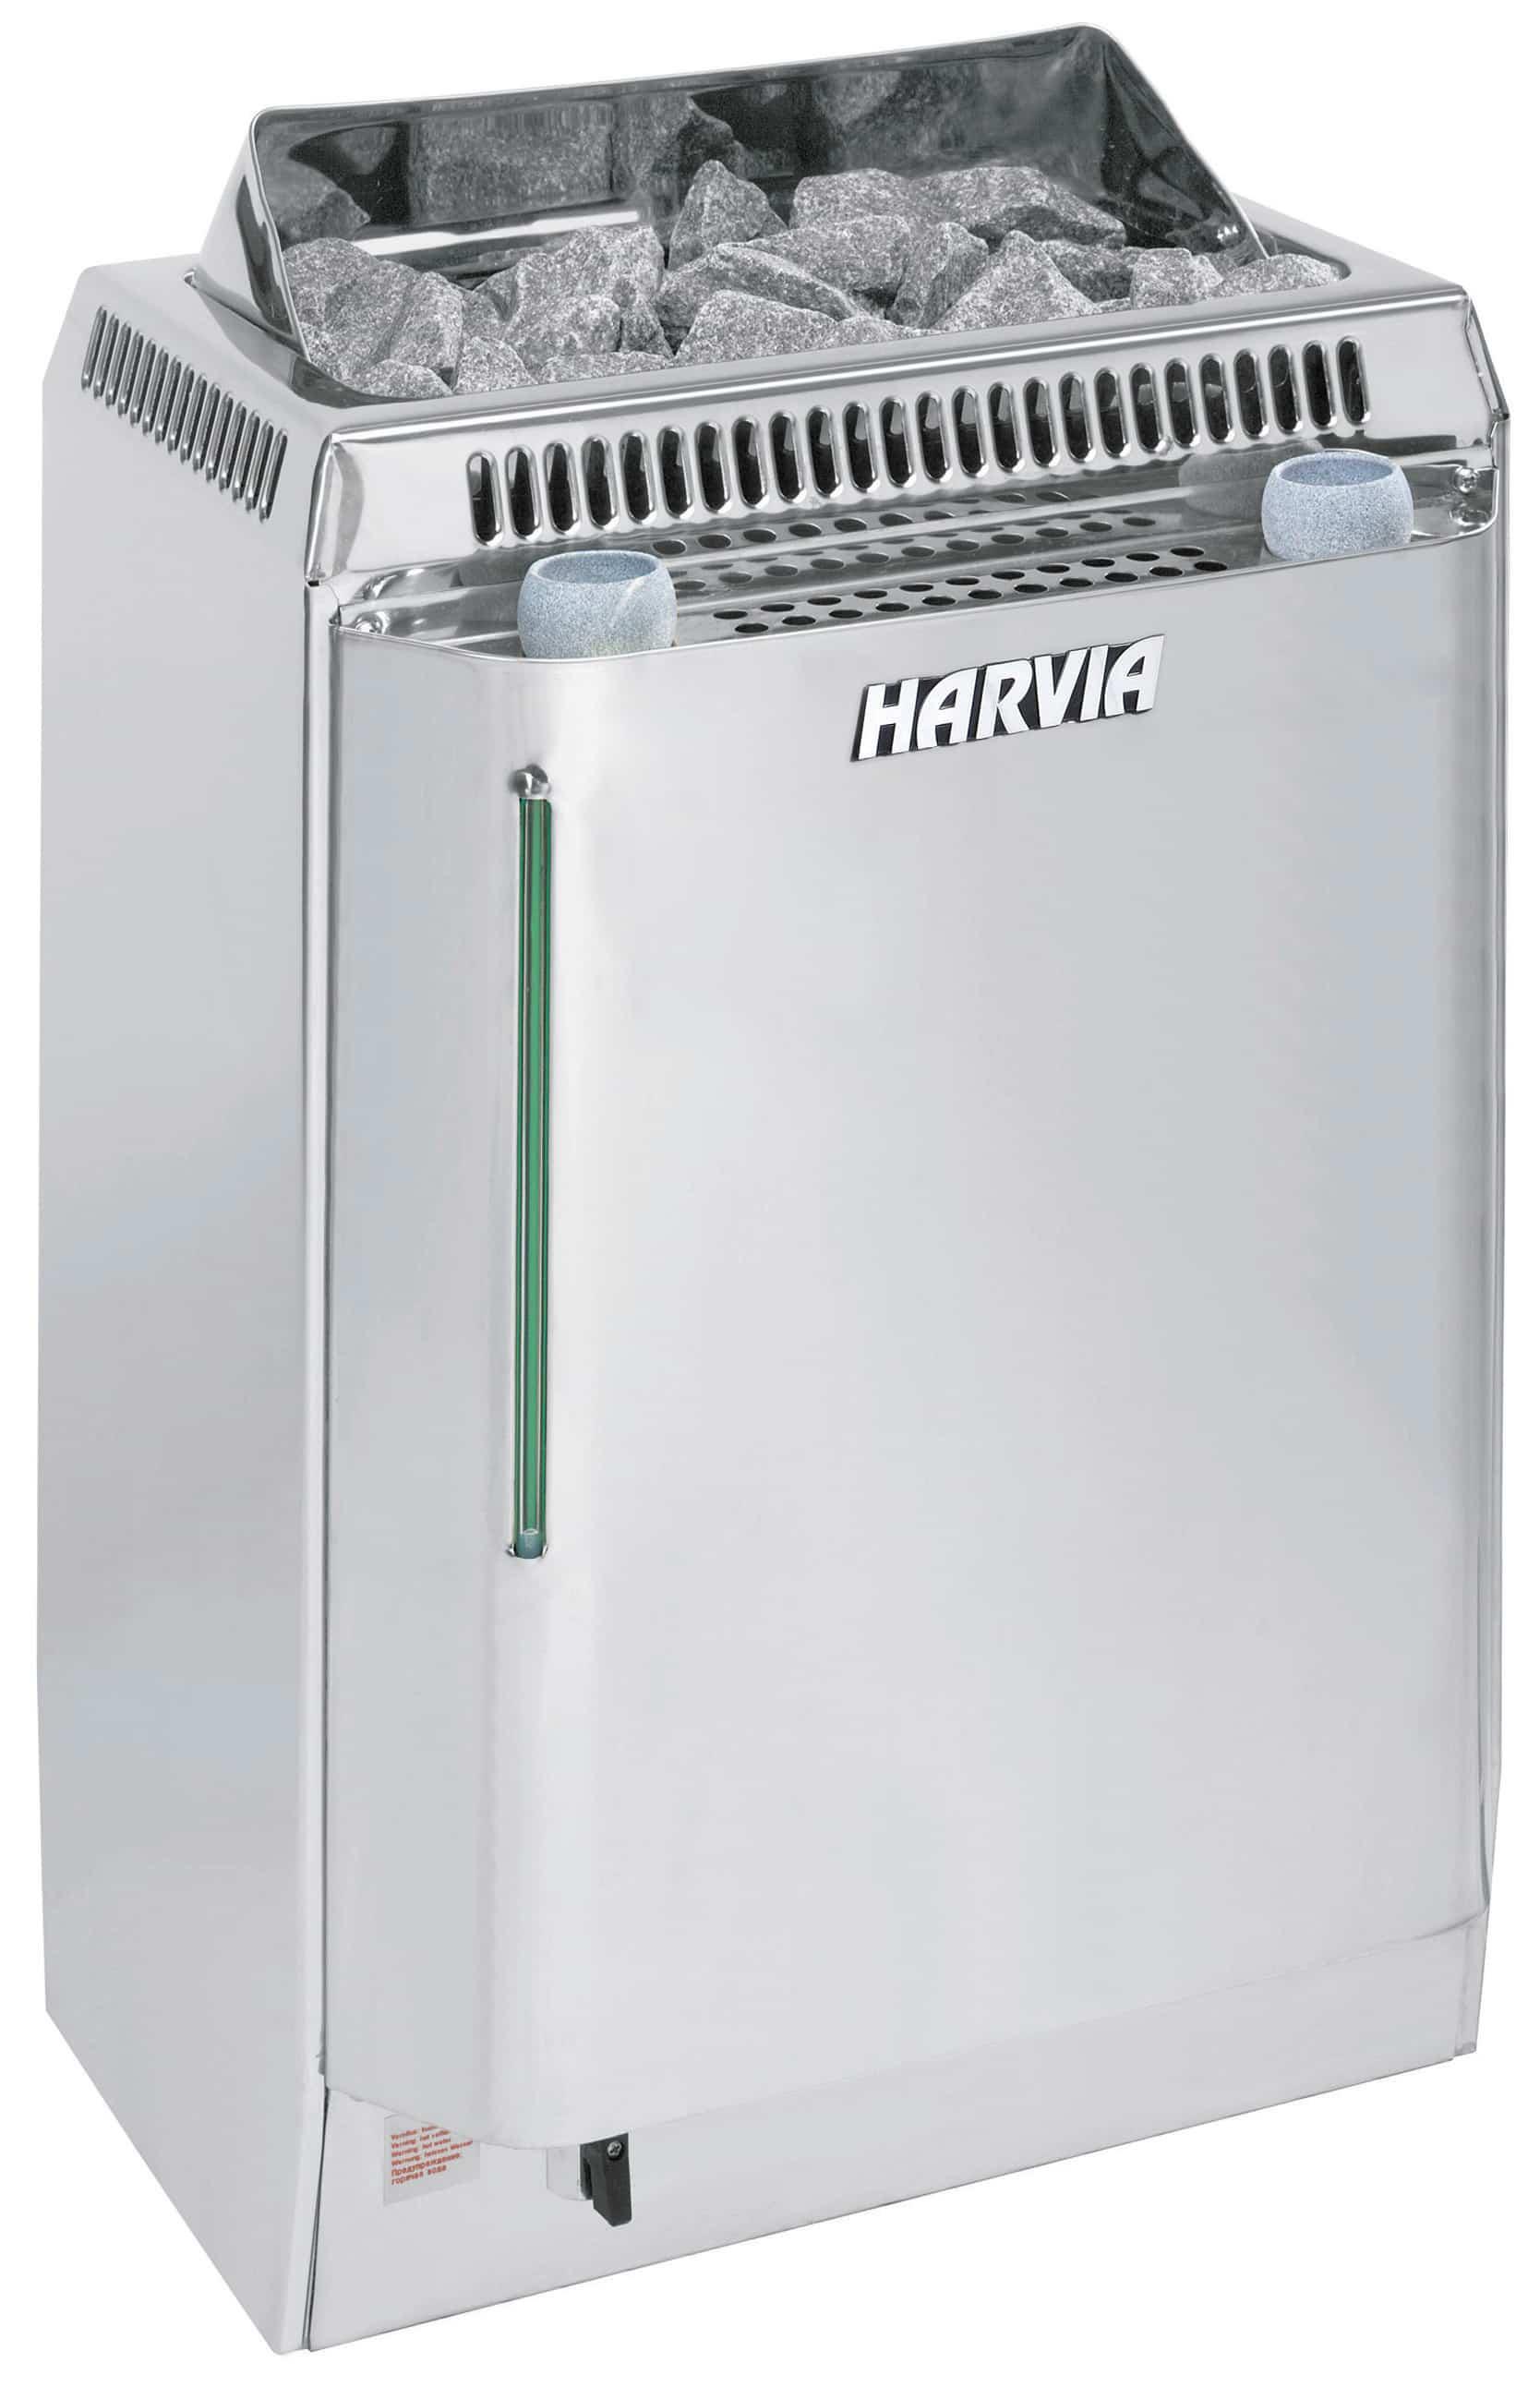 HARVIA Topclass Combi Automatic  KV50SEA